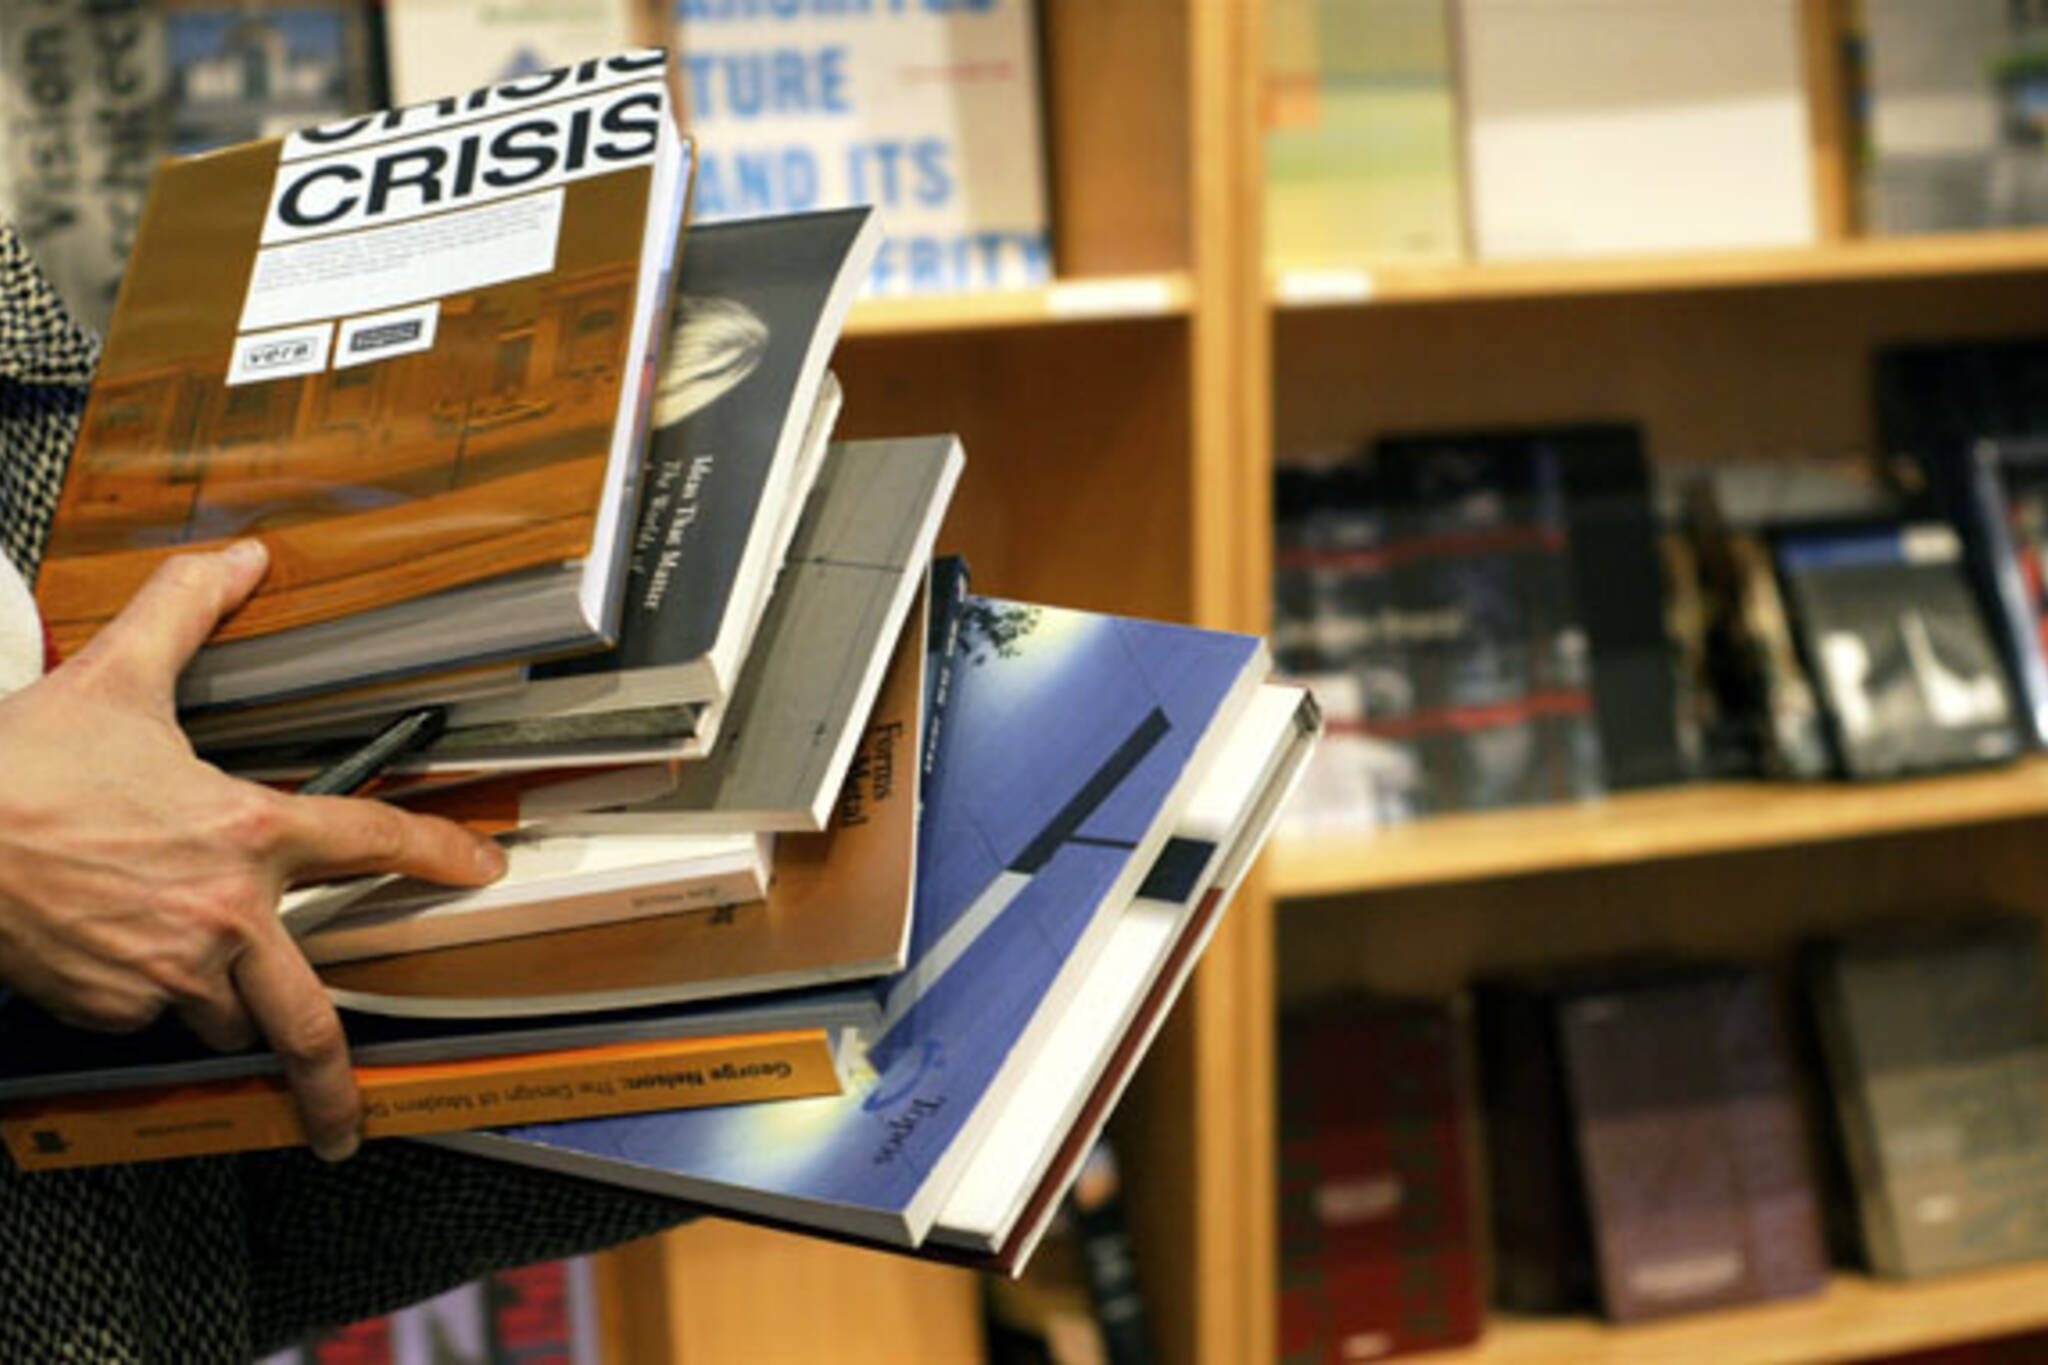 David Mirvish Books Closes